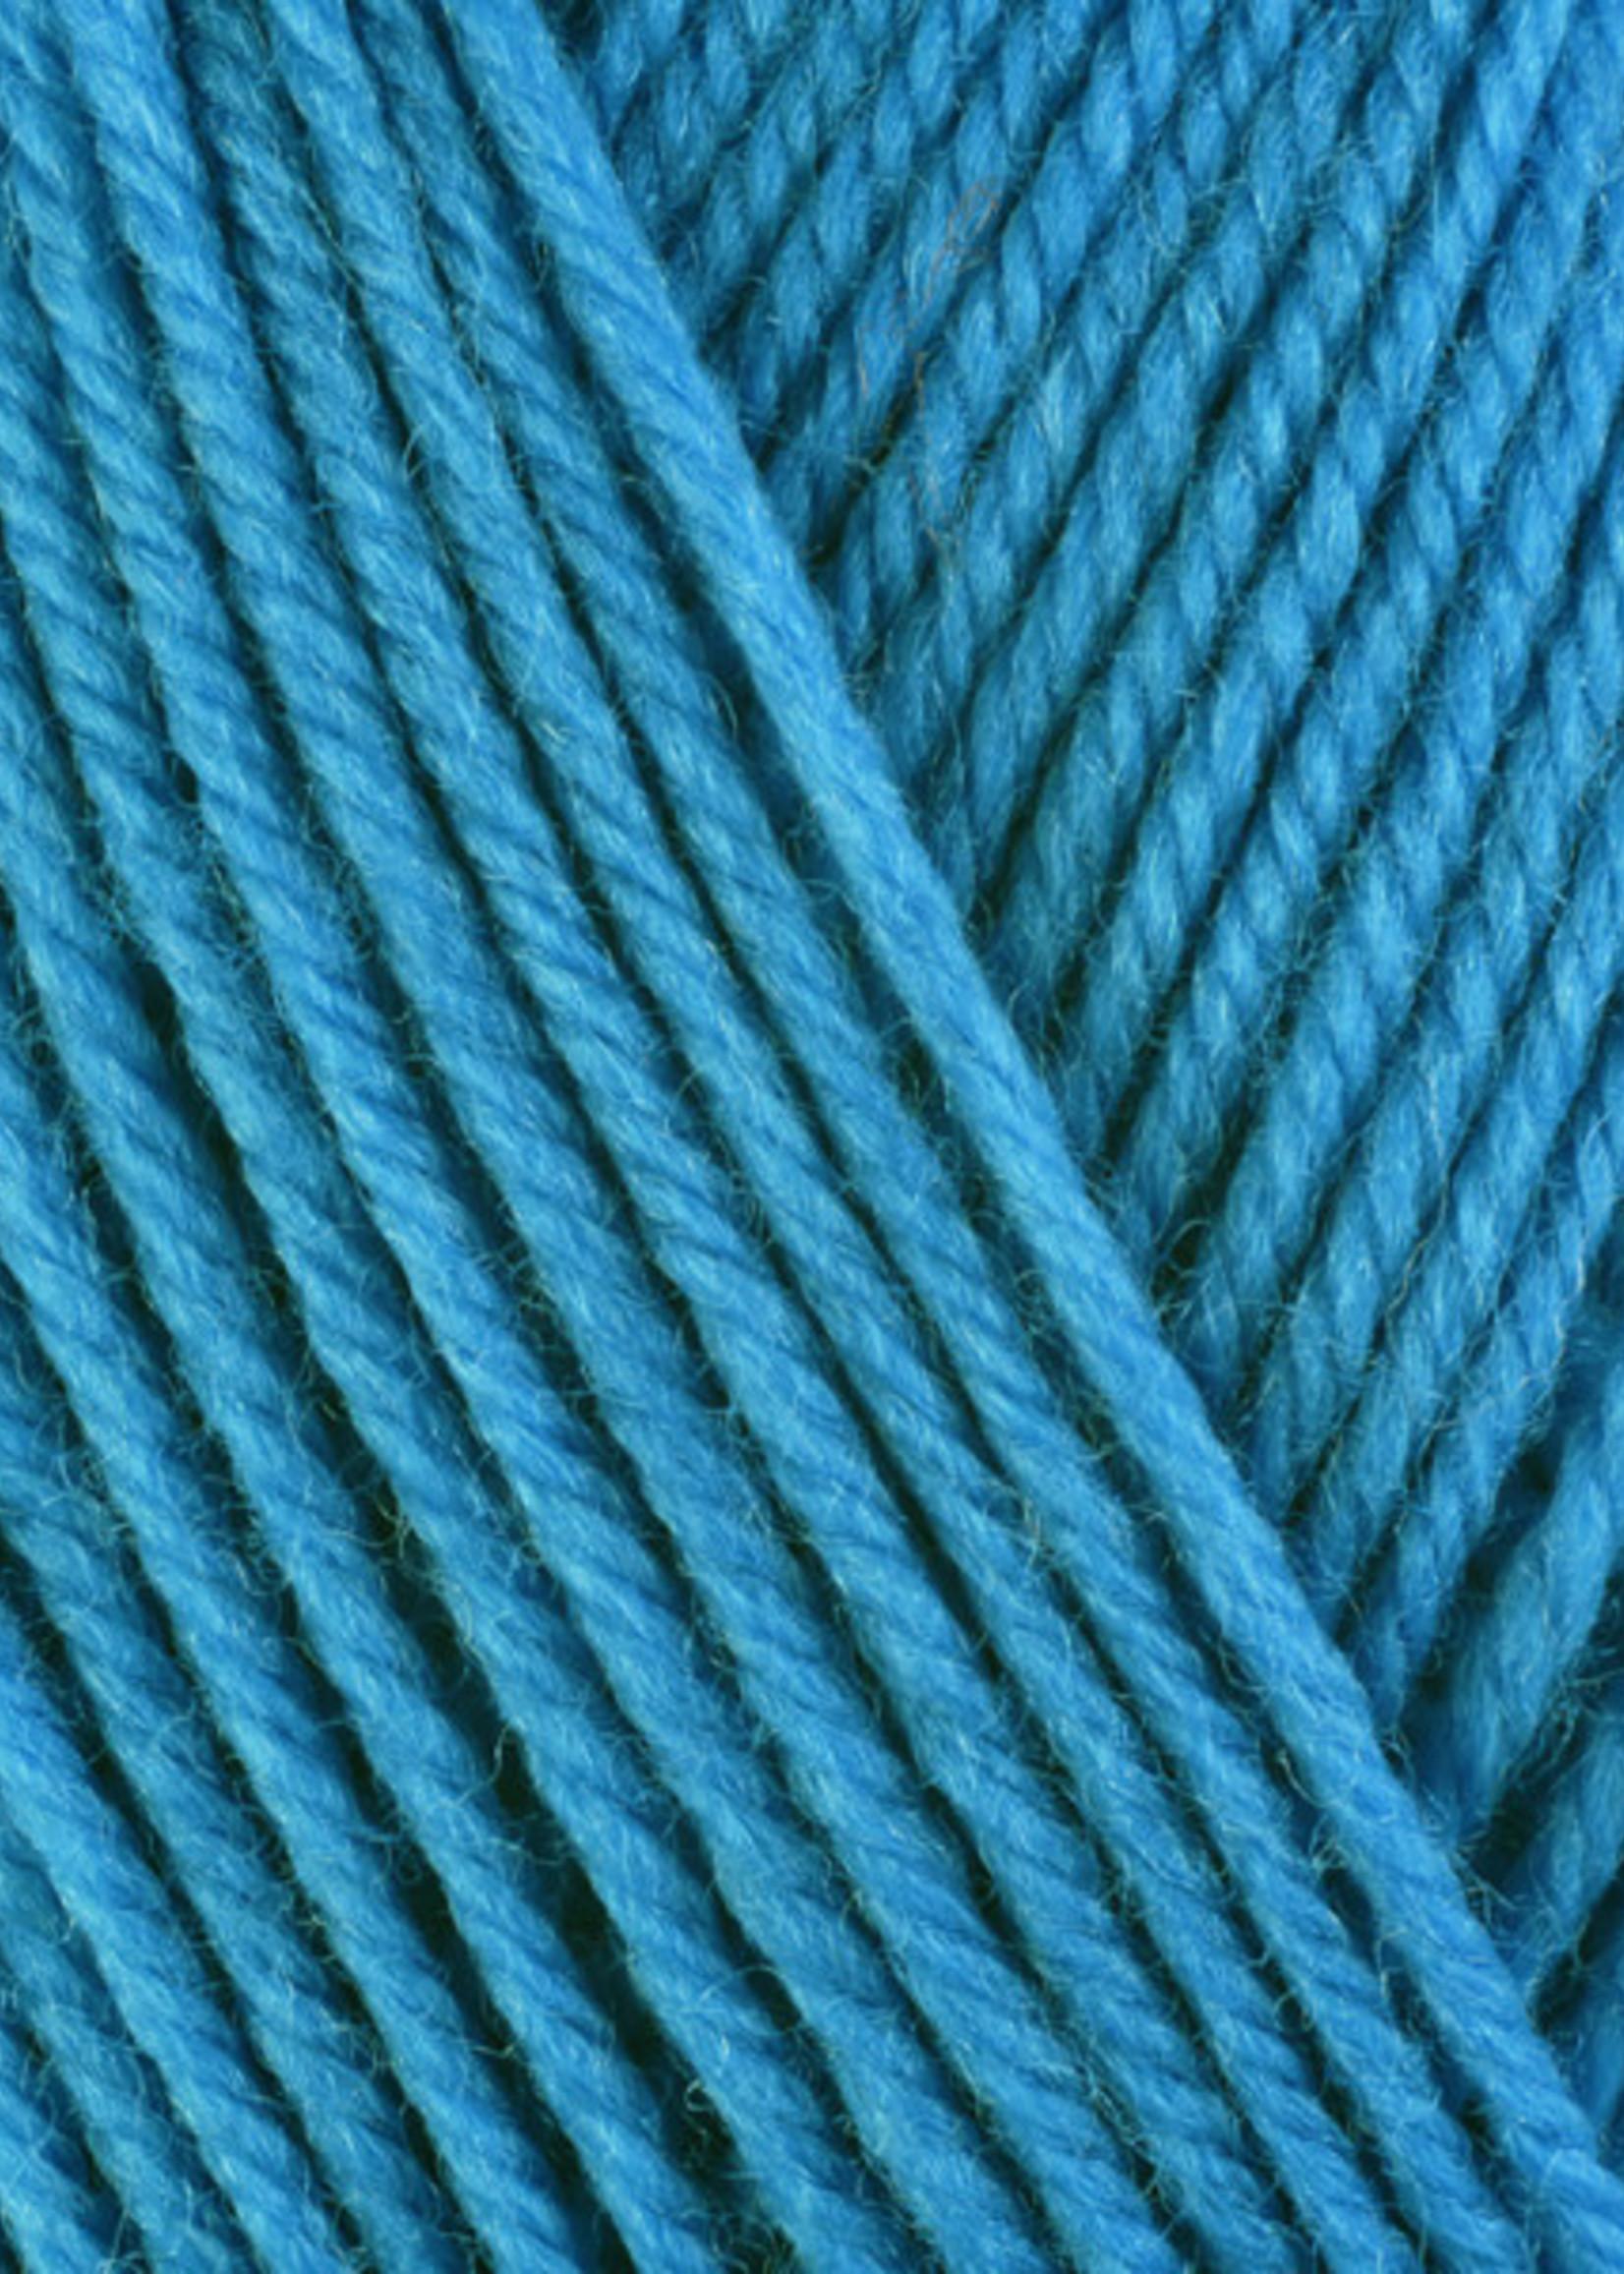 Berroco Berroco Ultra Wool 3332 Blue Jay